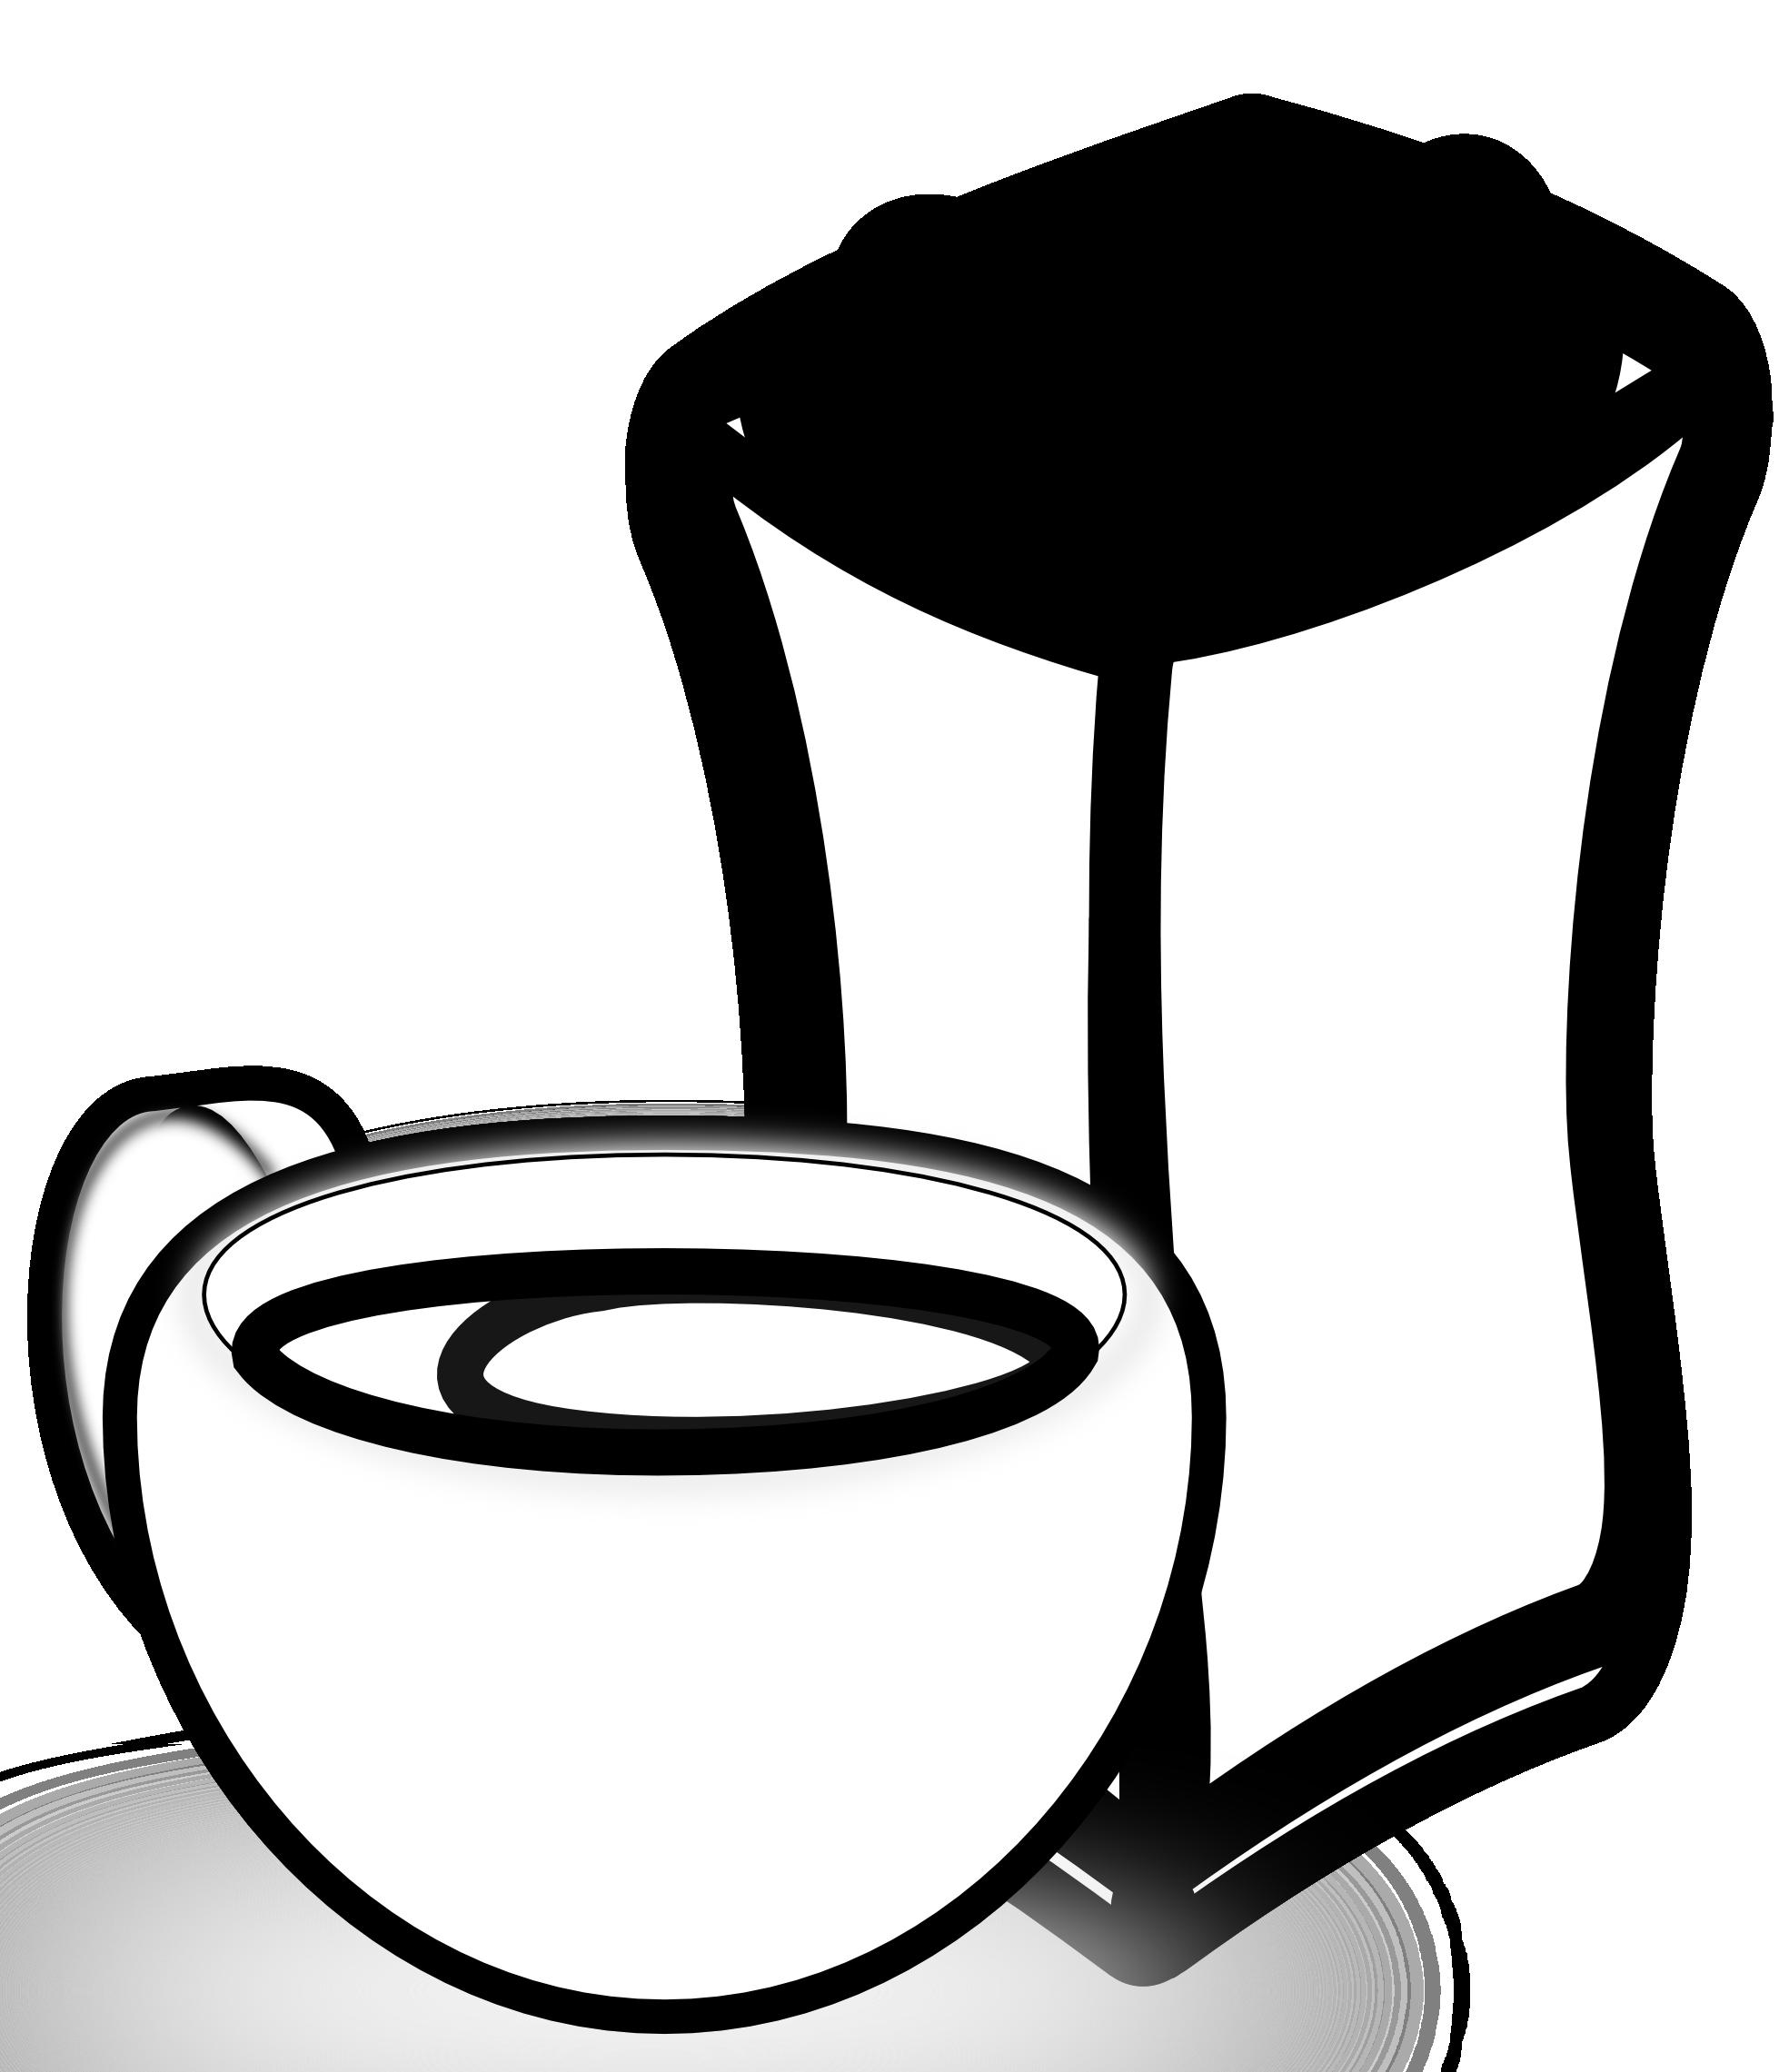 Clipart coffee black and white. Panda free images coffeeclipartblackandwhite